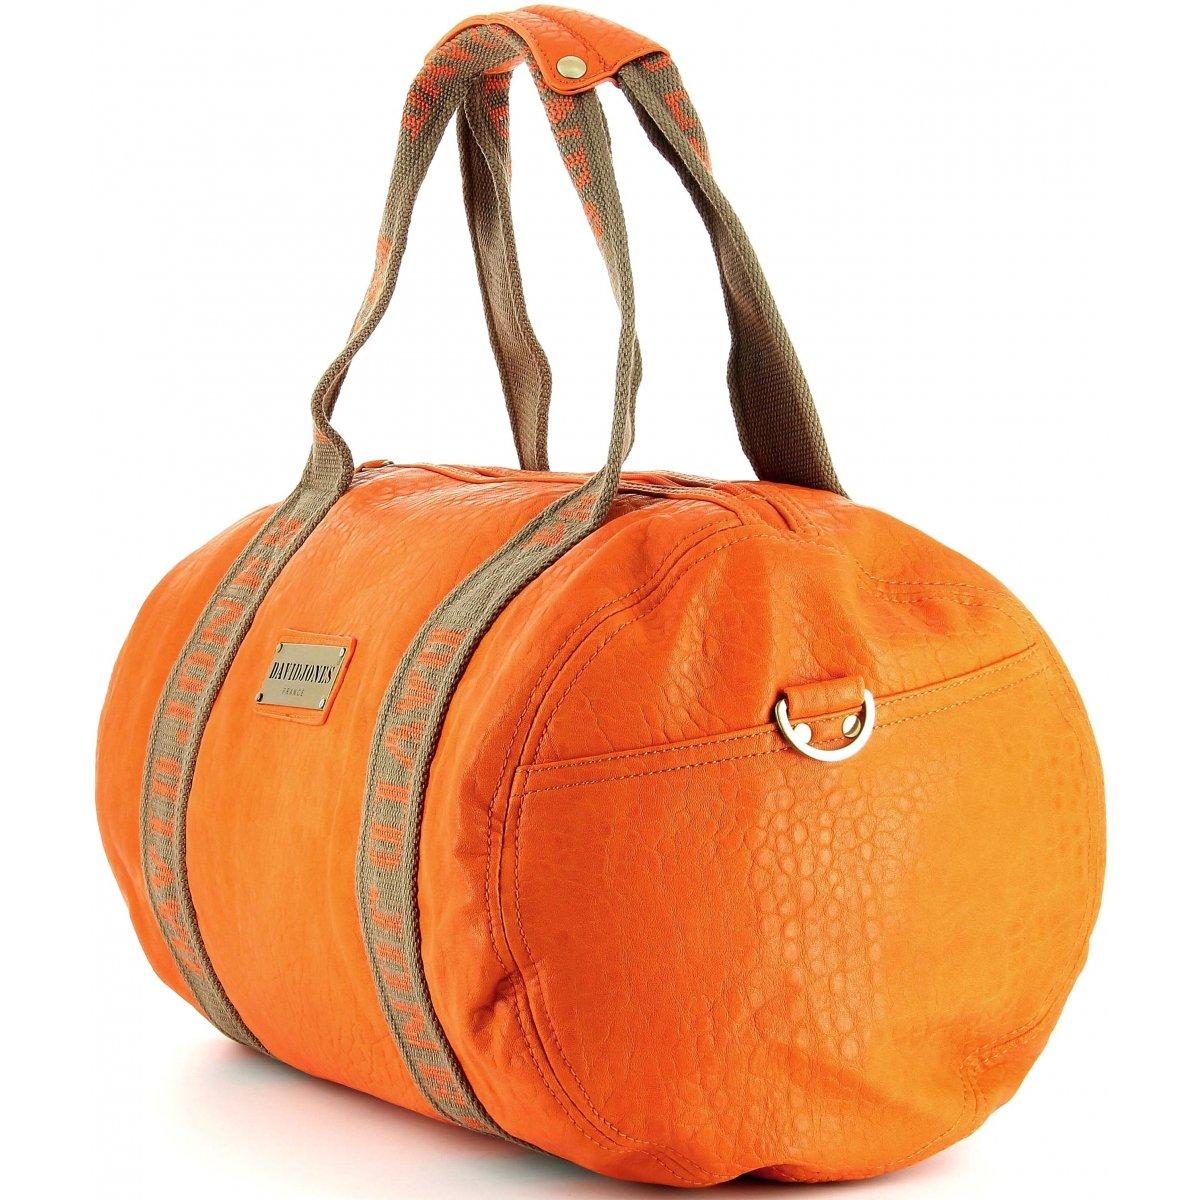 sac de voyage 48h david jones djcm004512 couleur orange promotion. Black Bedroom Furniture Sets. Home Design Ideas